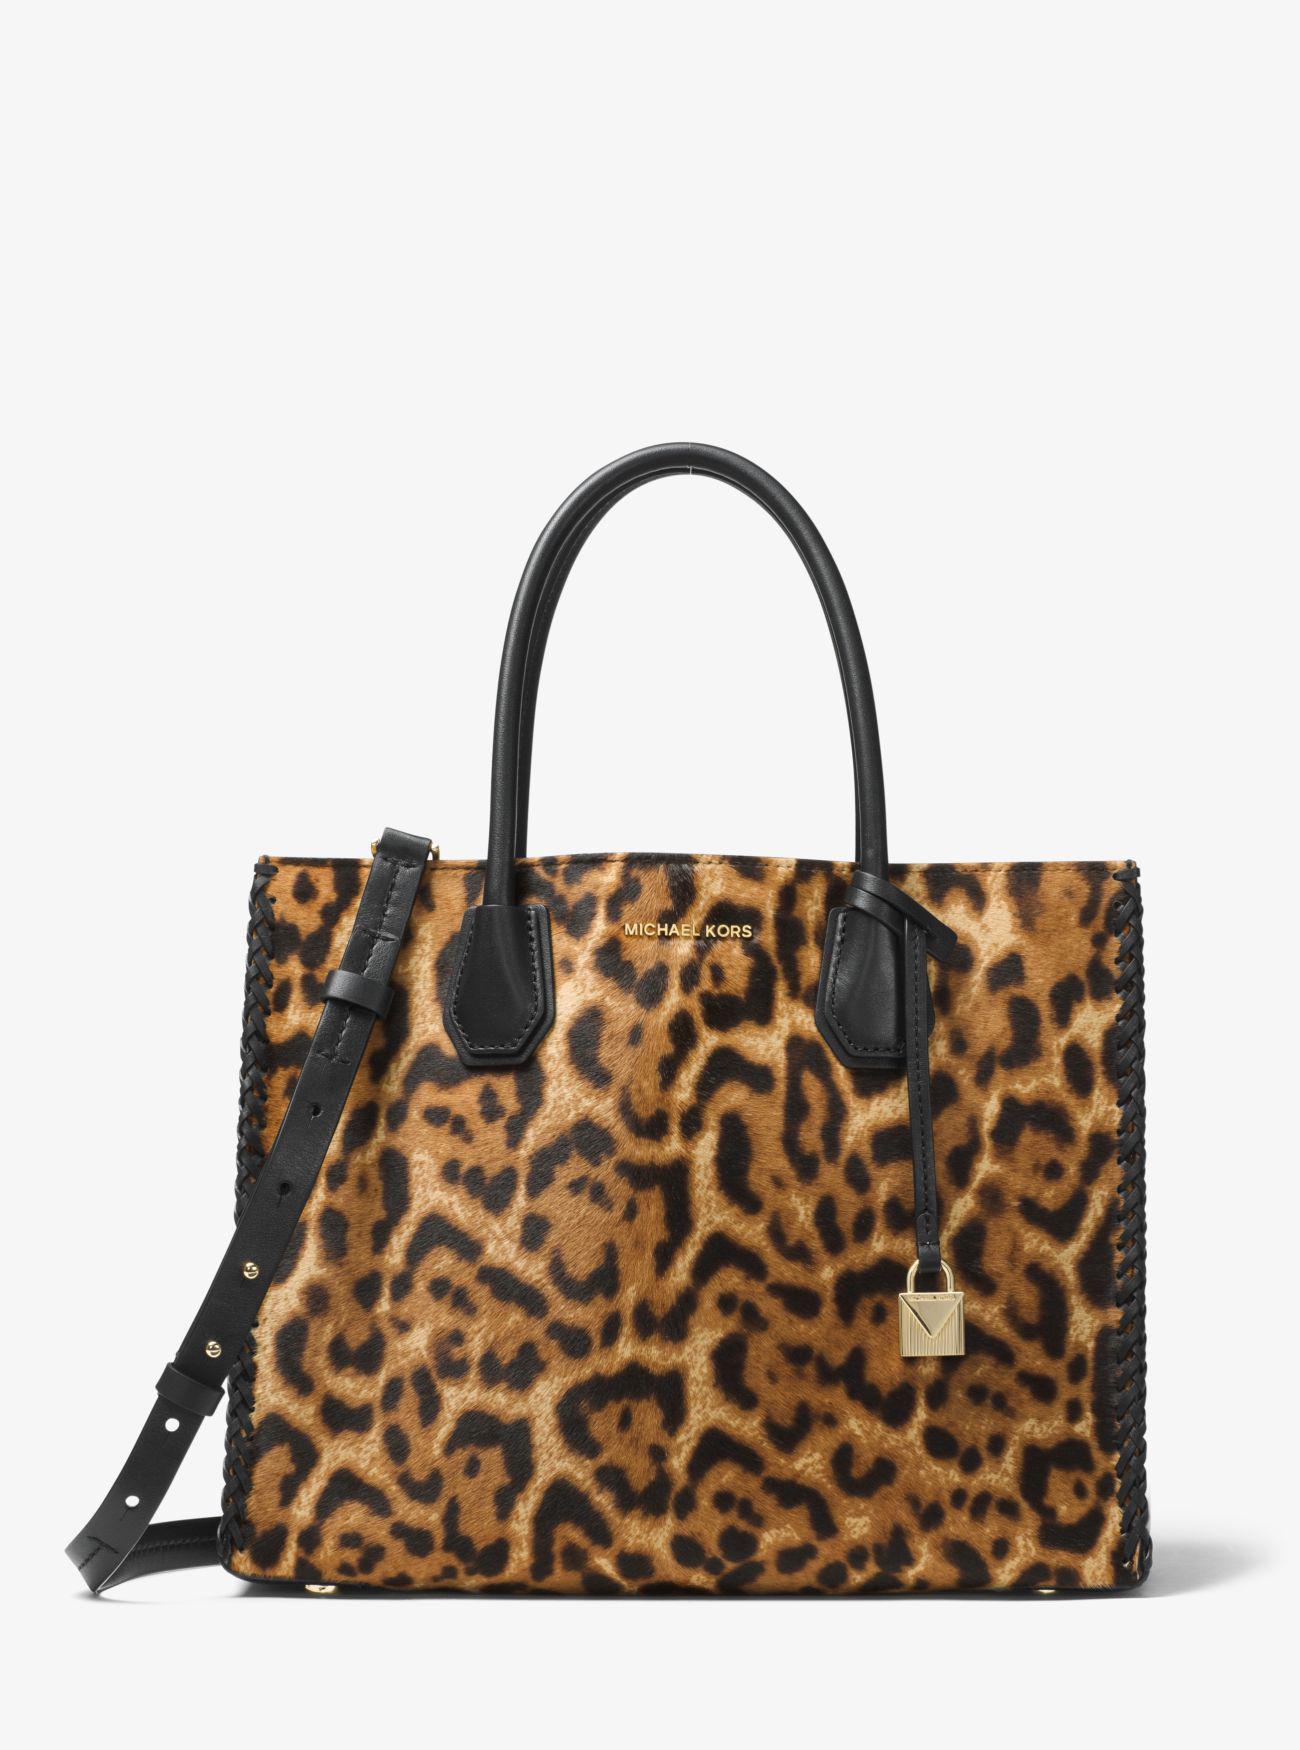 2635c8549d4a Michael Kors Mercer Leopard Calf Hair Tote in Brown - Lyst